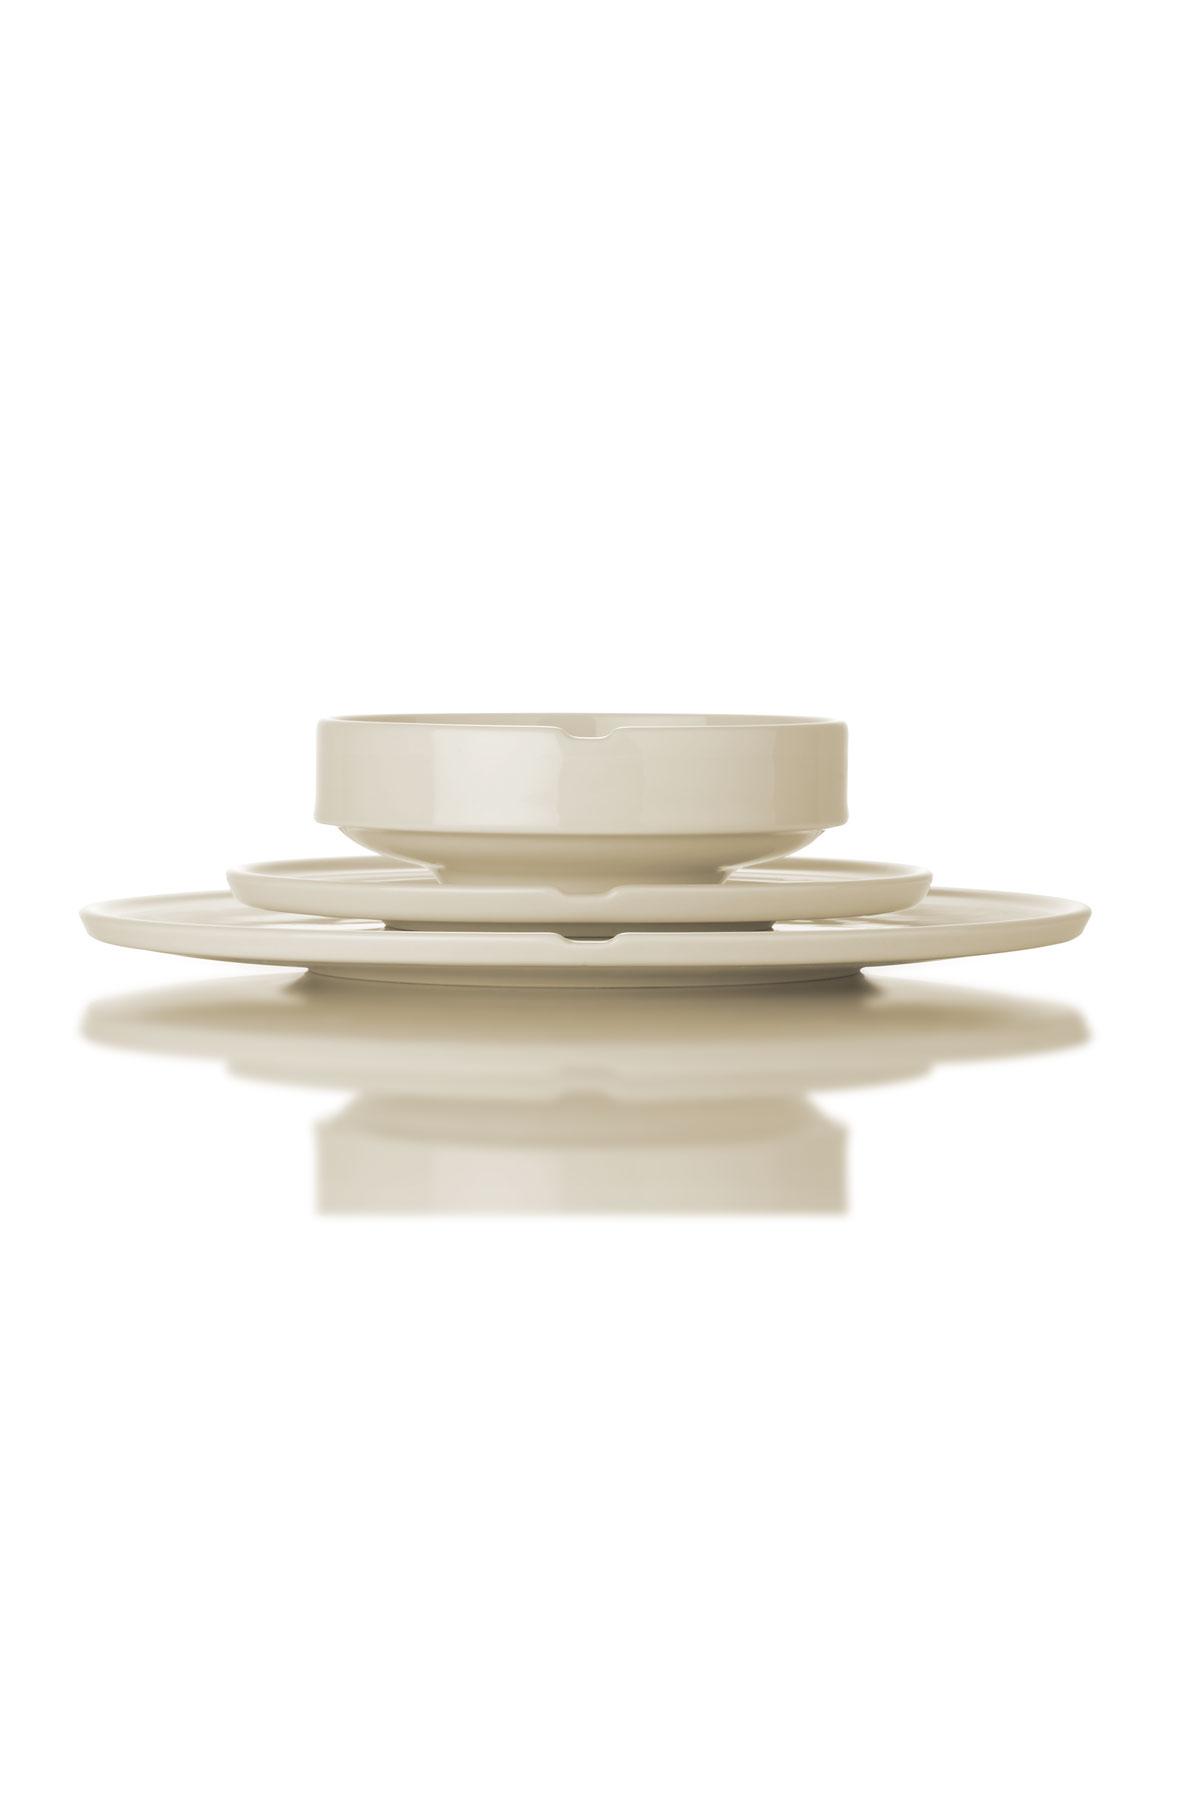 Kütahya Porselen Chef Taste Of 14 cm Joker Kase Krem